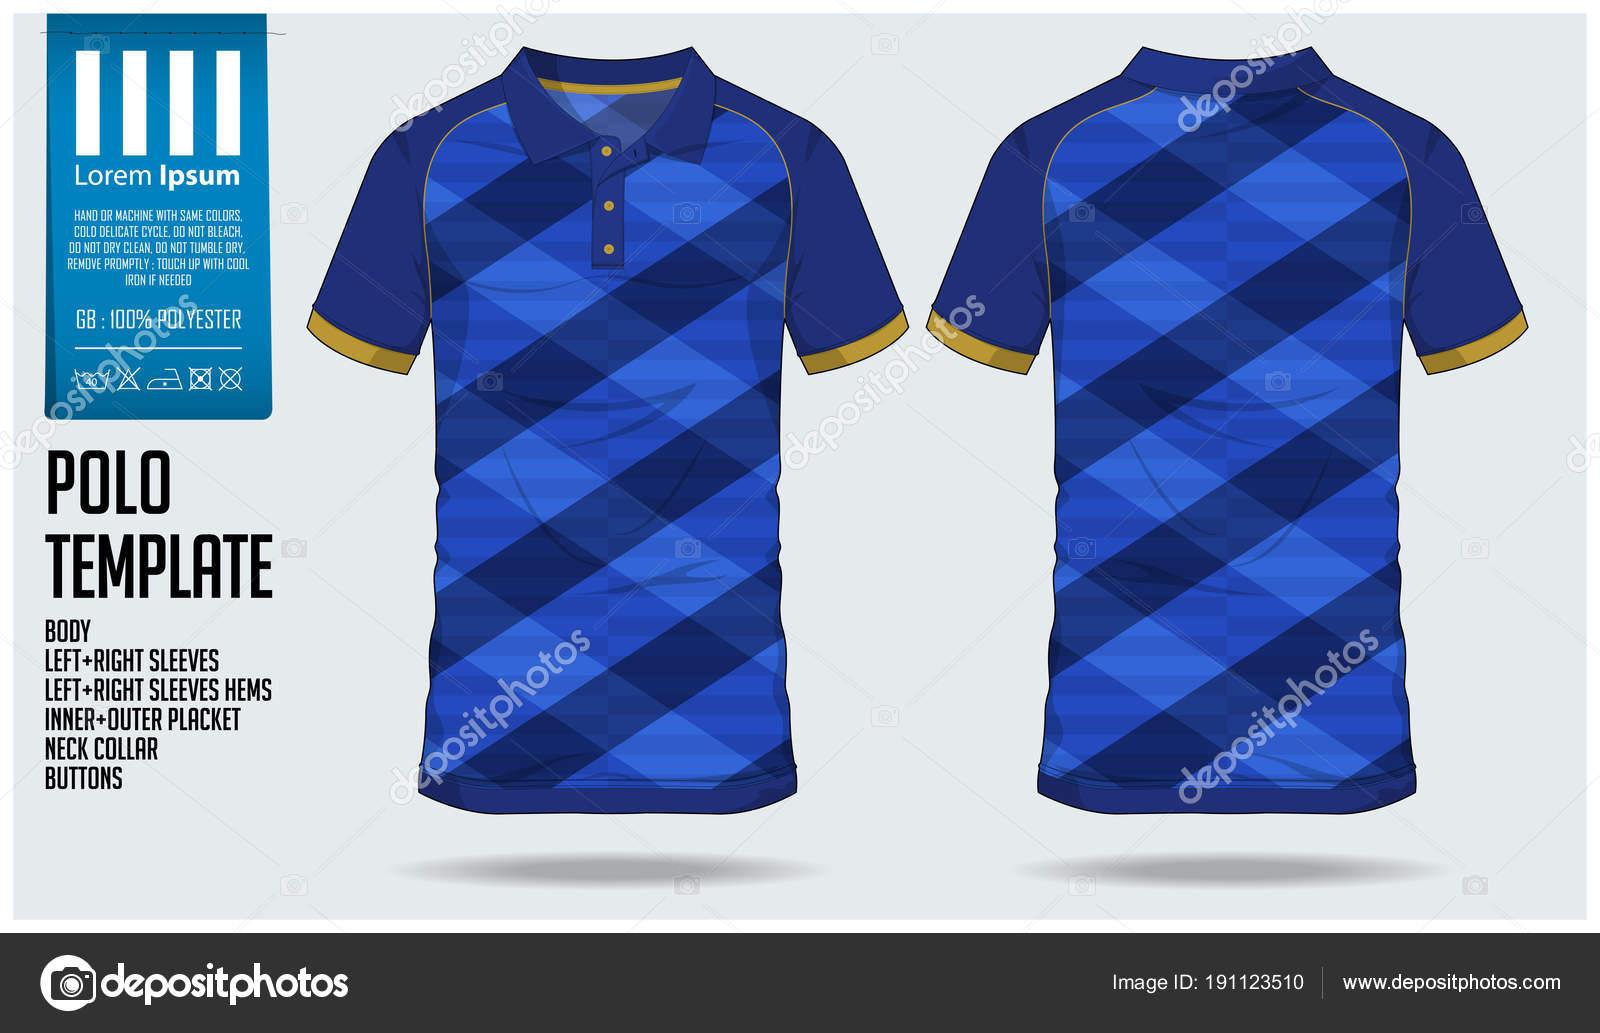 Blue Polo t-shirt sport template design for soccer jersey, football ...